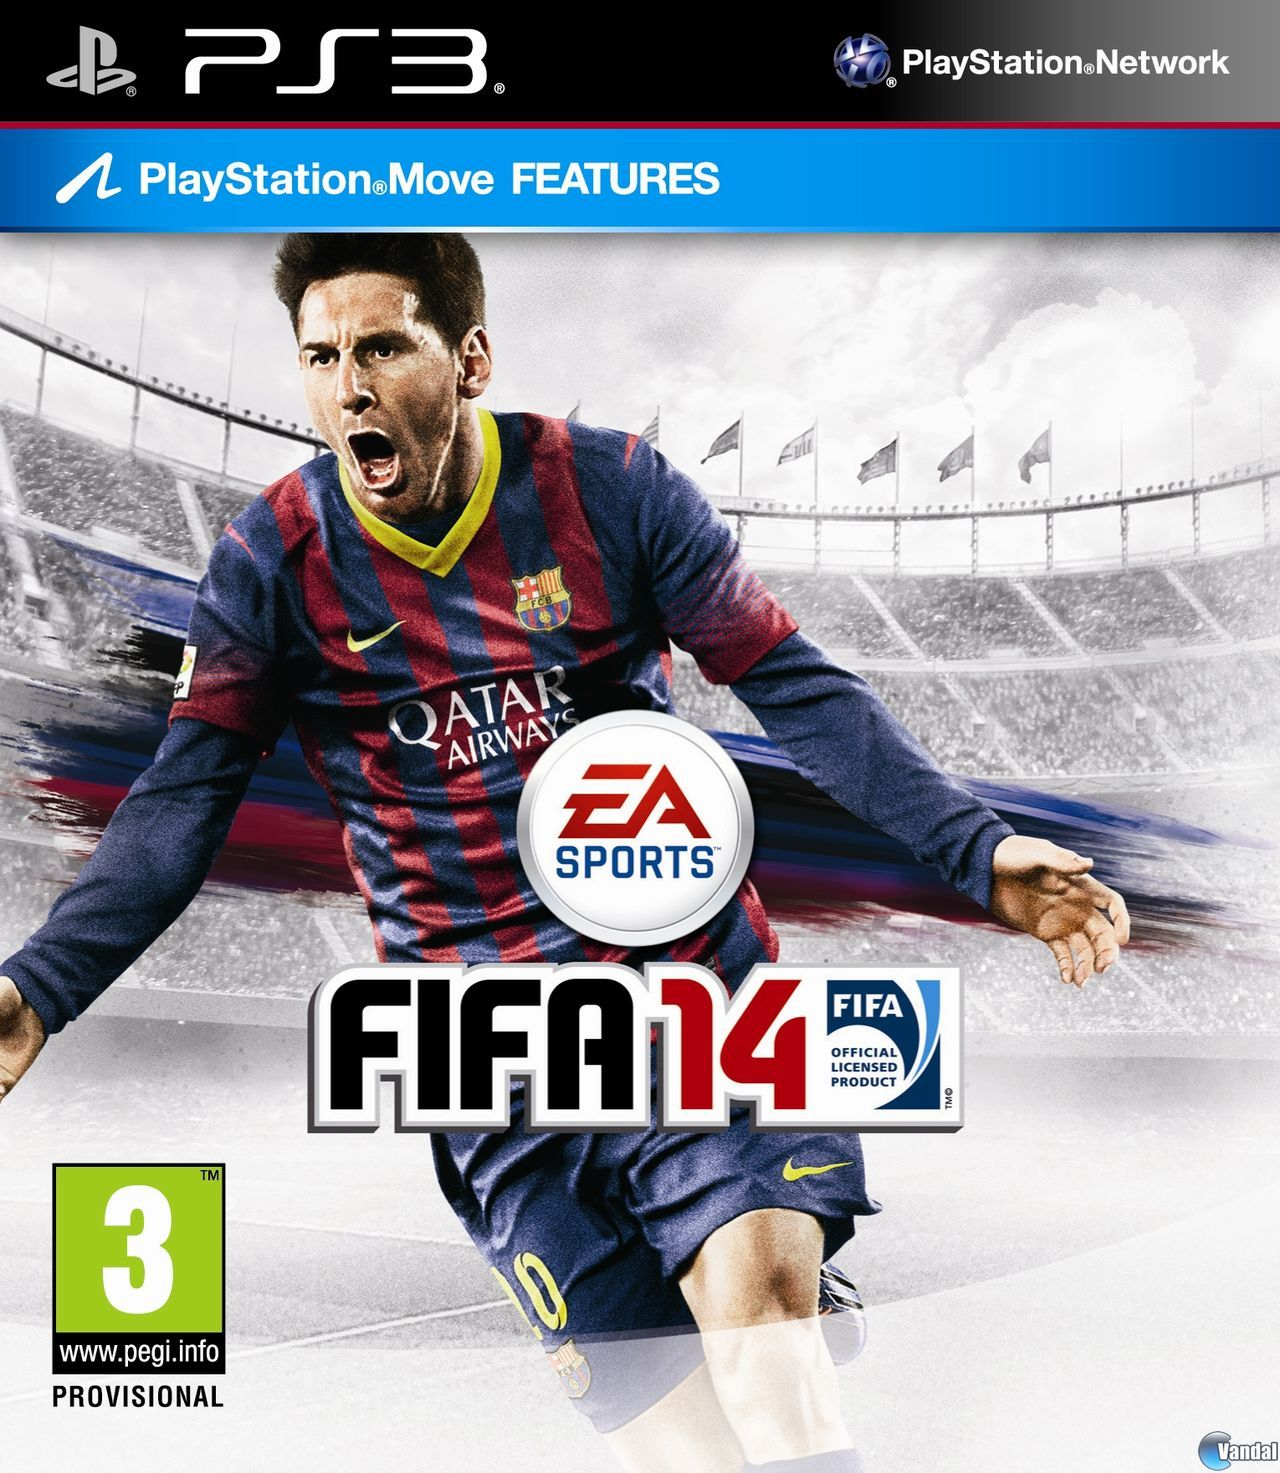 Imagen 23 de FIFA 14 para PlayStation 3